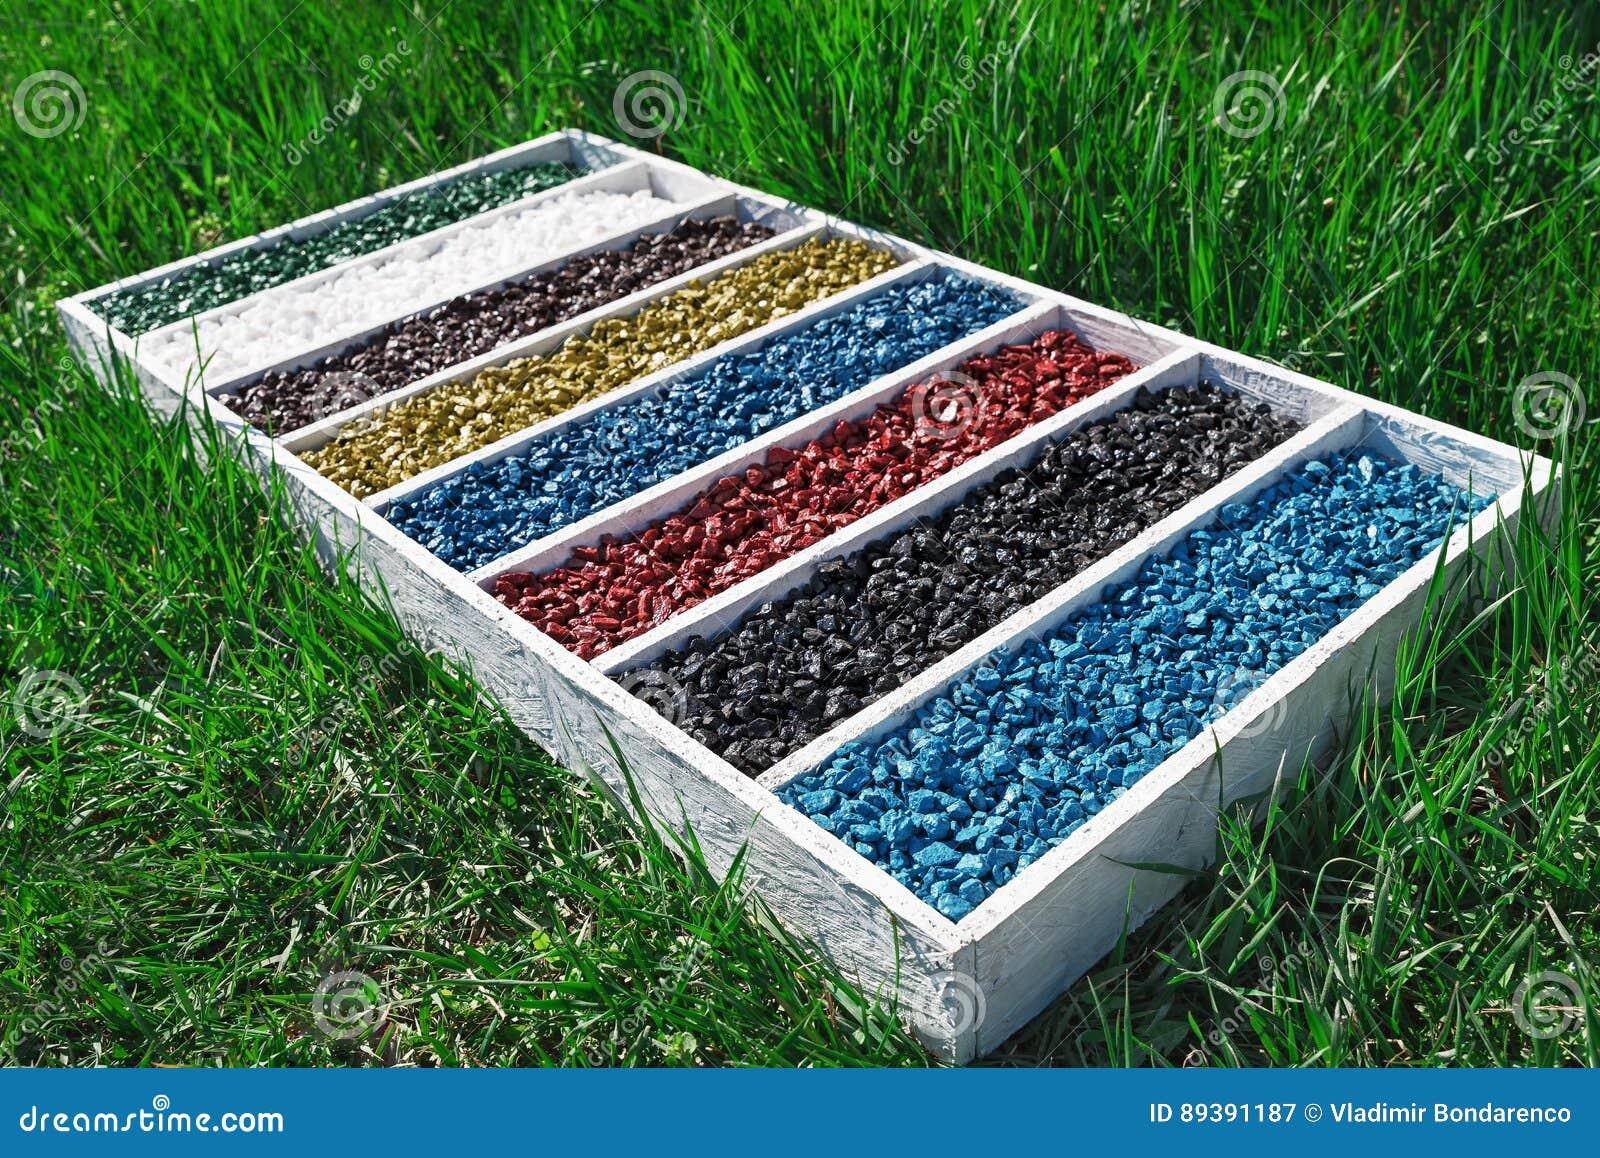 Colorful Rocks In Wooden Box On The Green Grass, Art Aquarium Fish ...